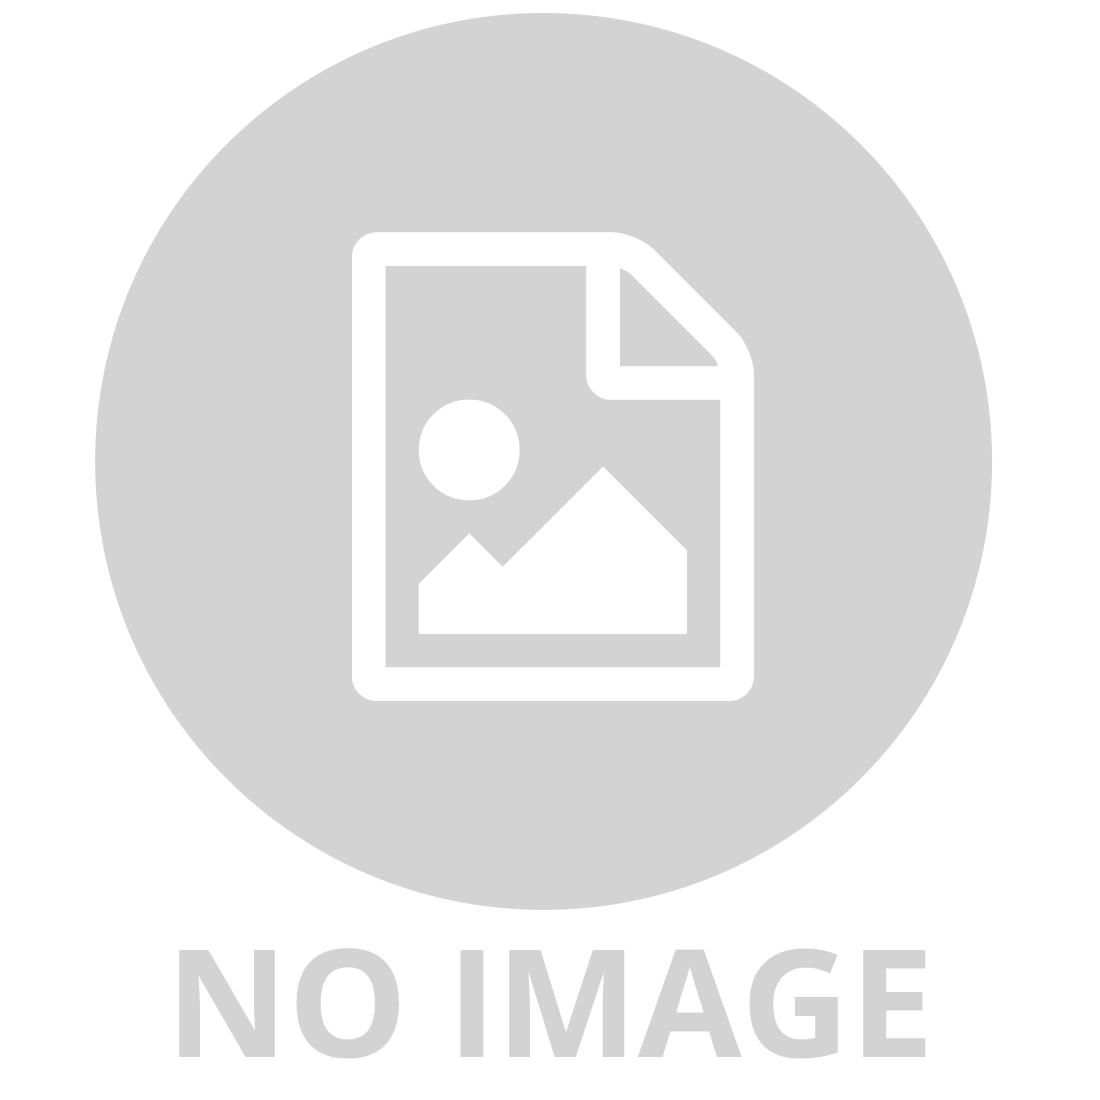 HUMBROL ENAMEL PAINT MATT BLUE #25